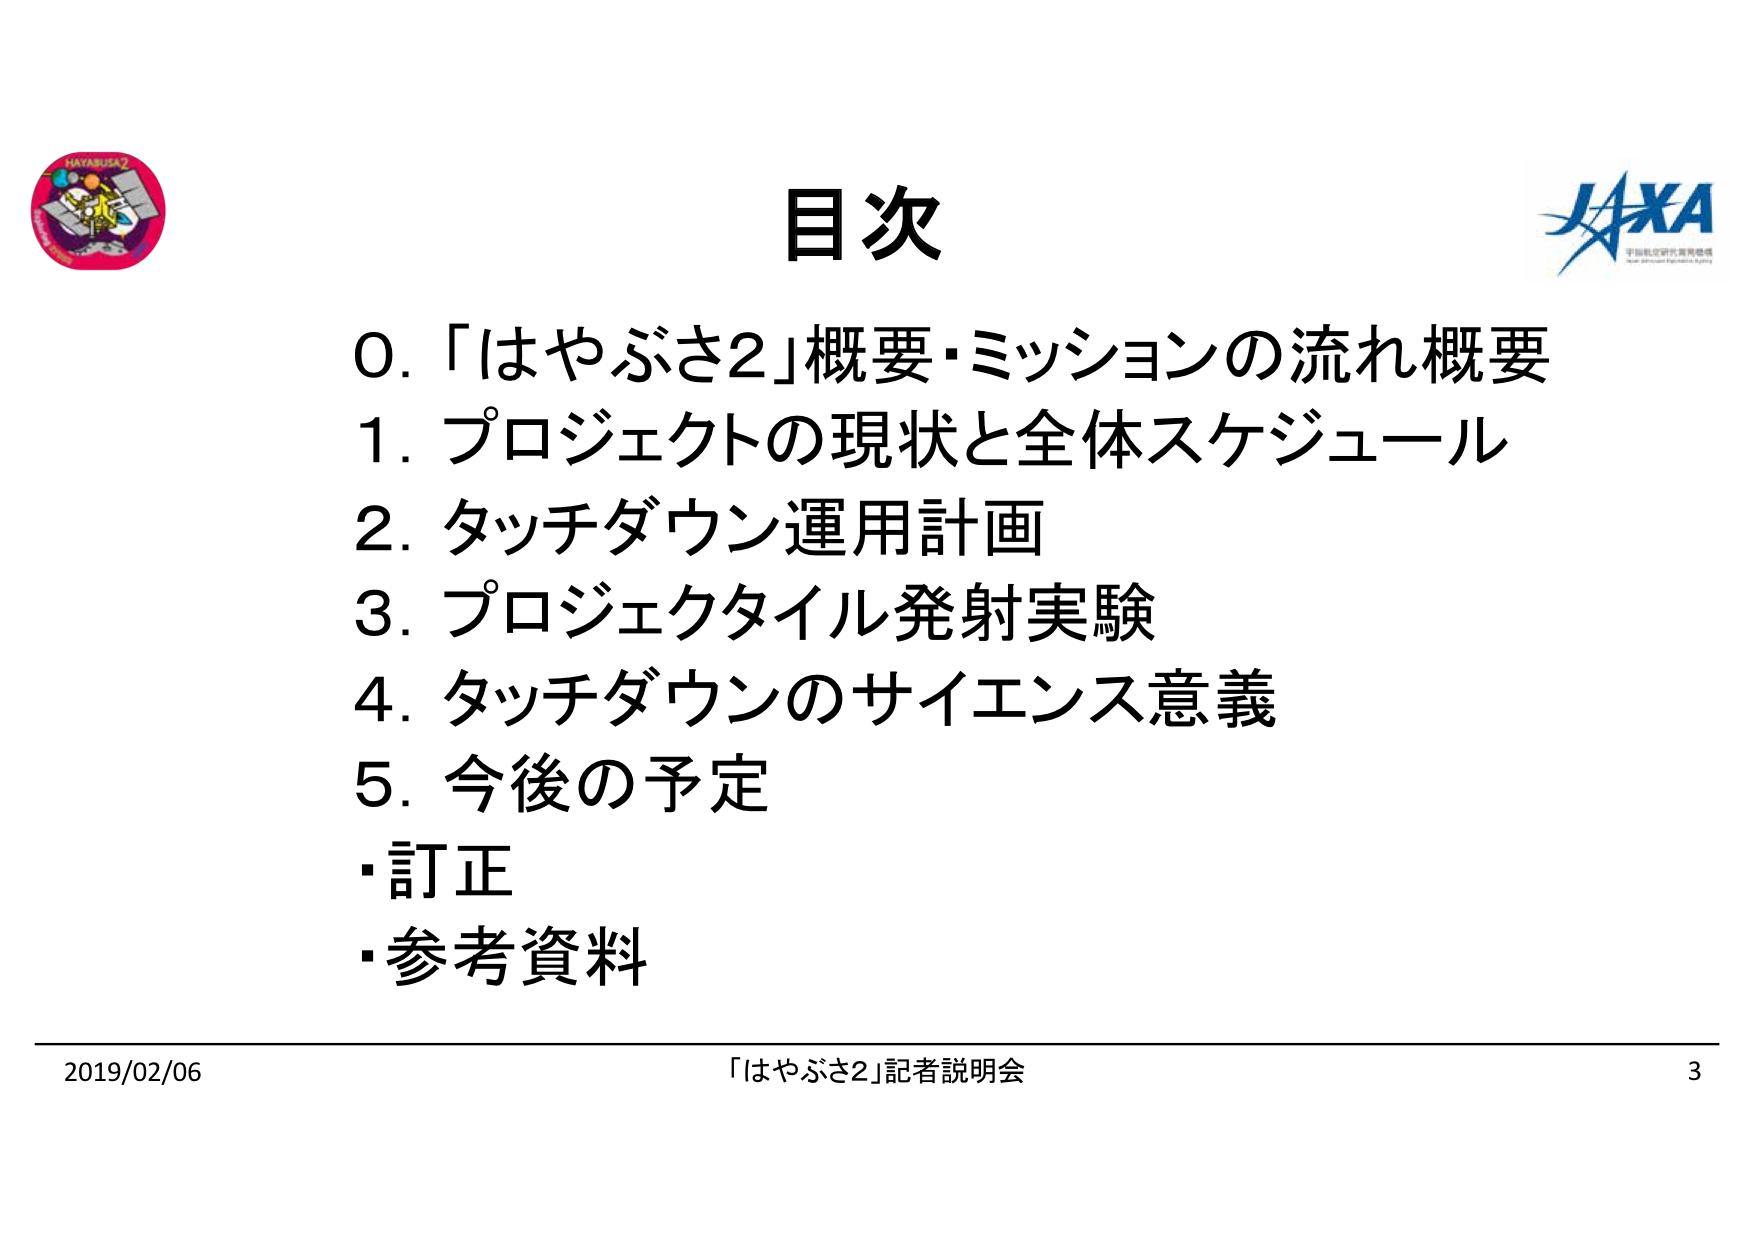 f:id:Imamura:20190204175457p:plain